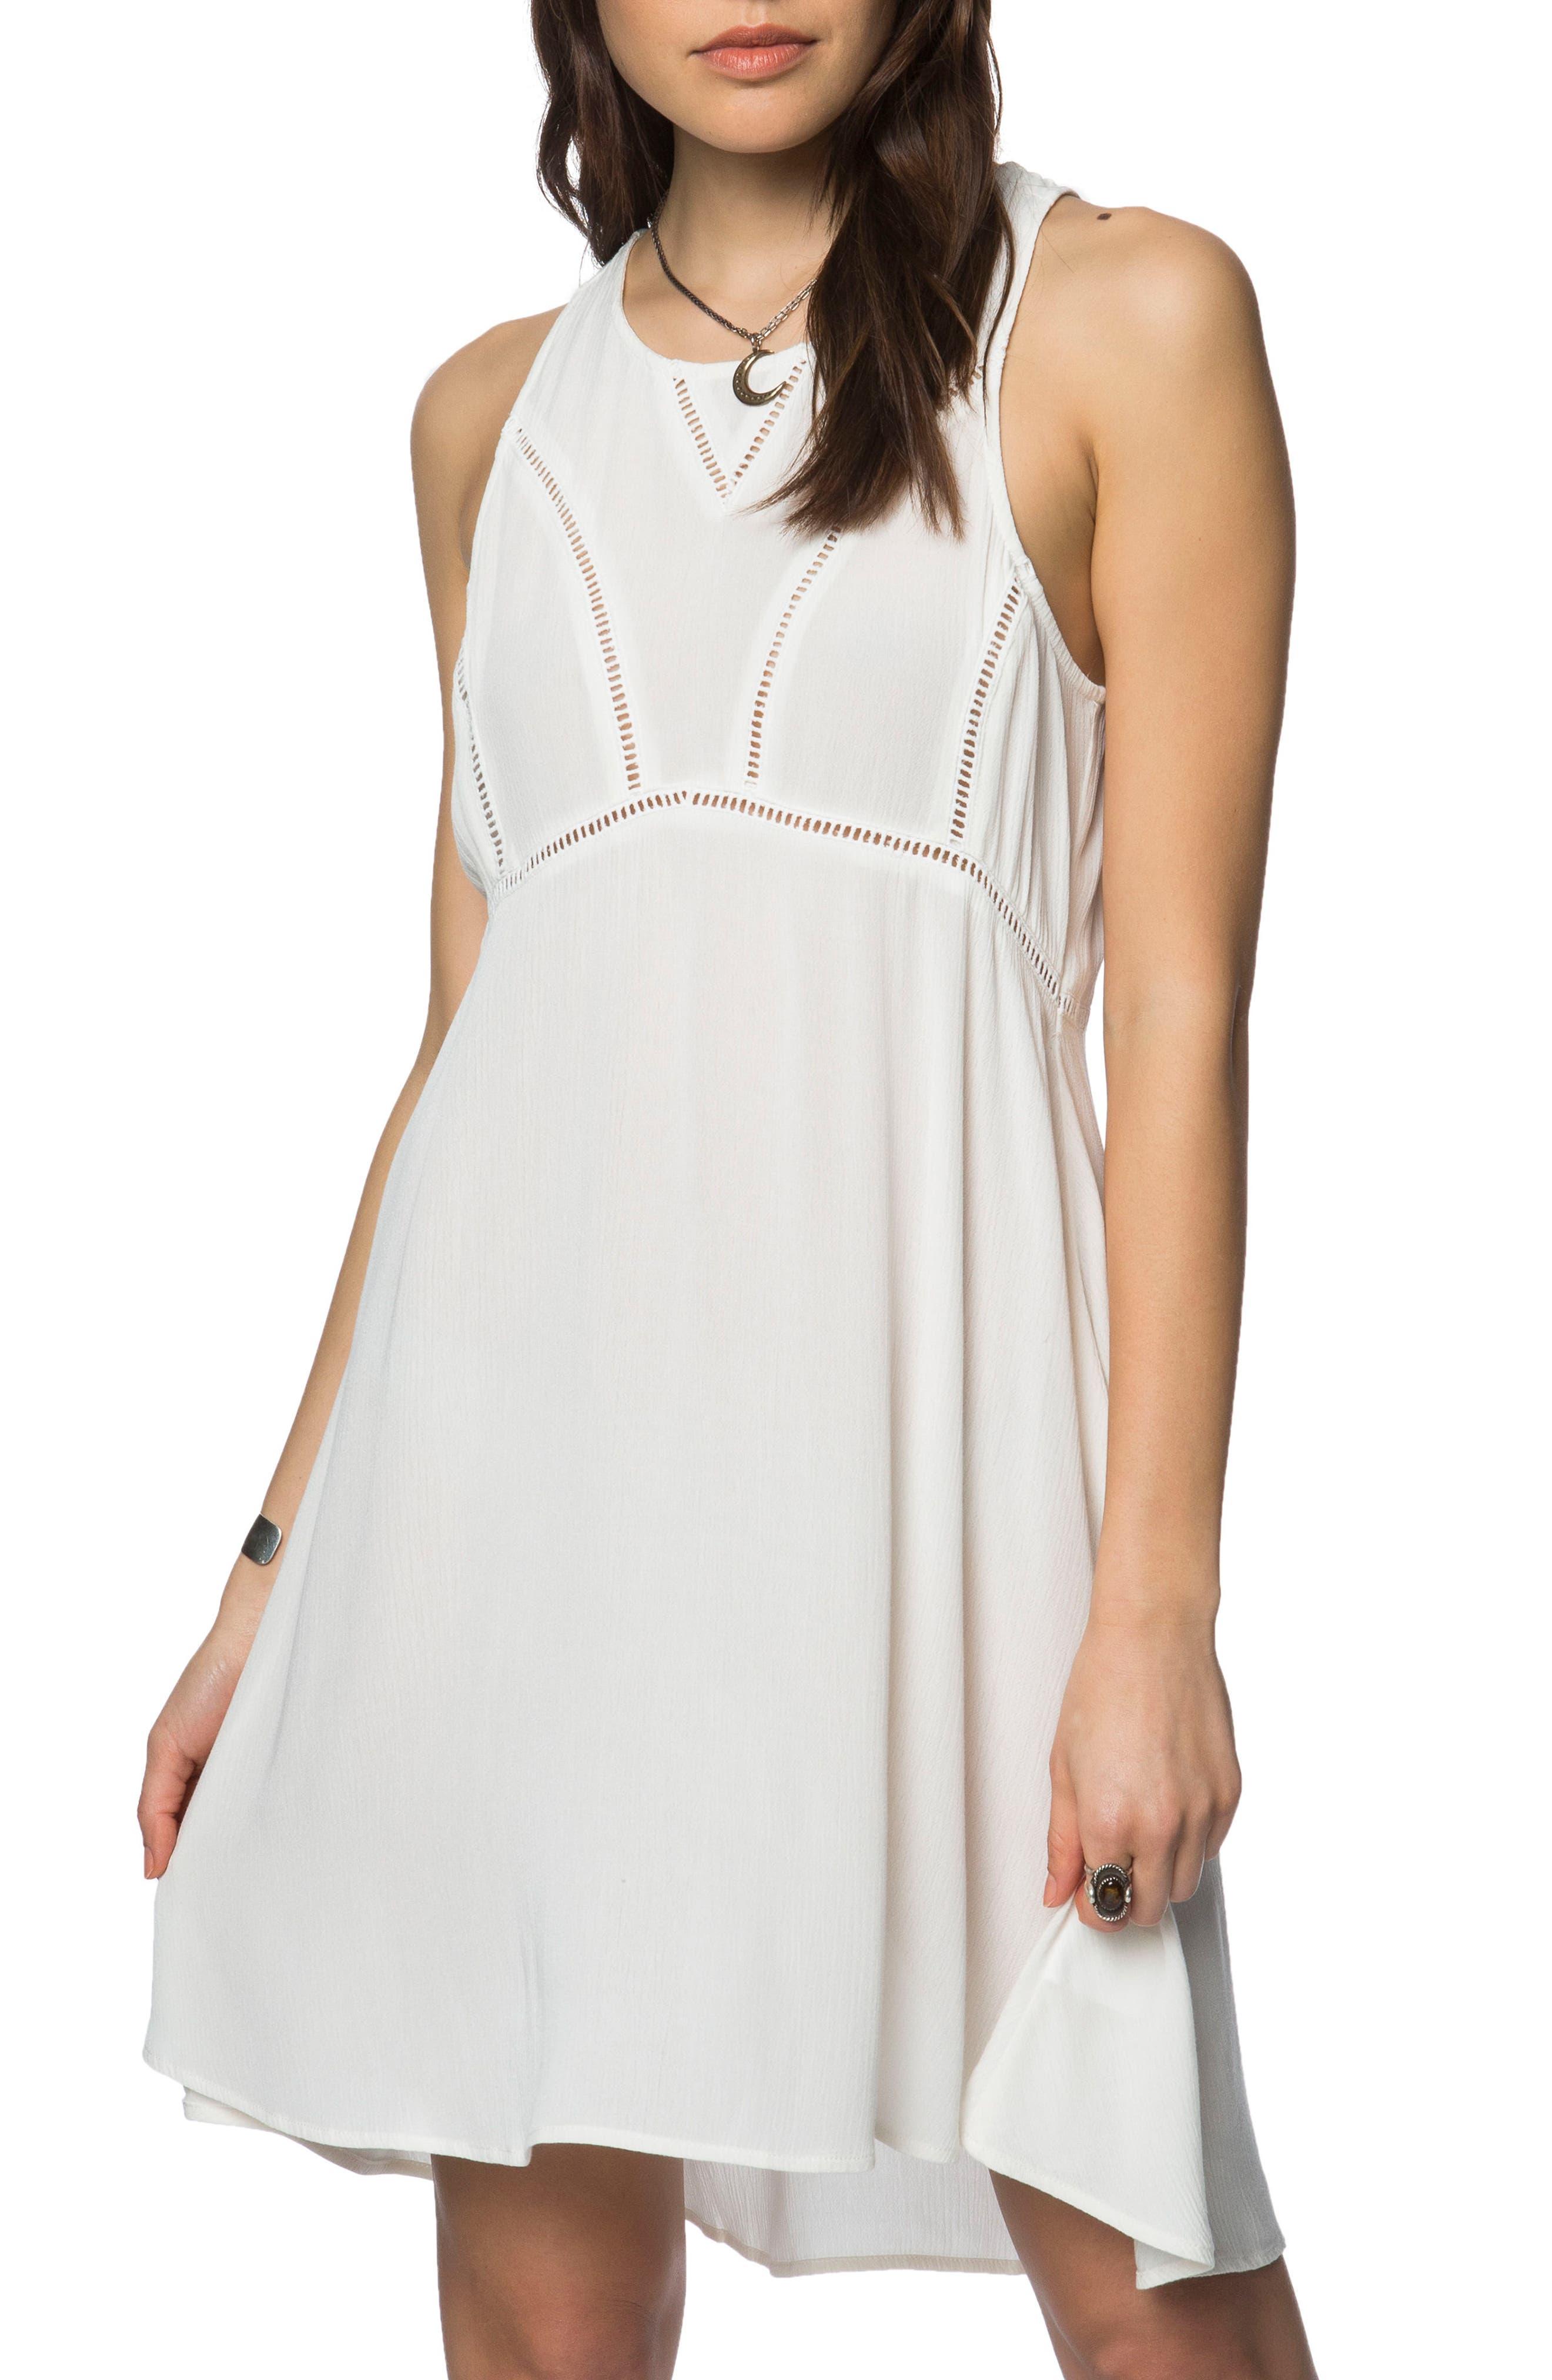 Alternate Image 1 Selected - O'Neill Braden Woven Dress